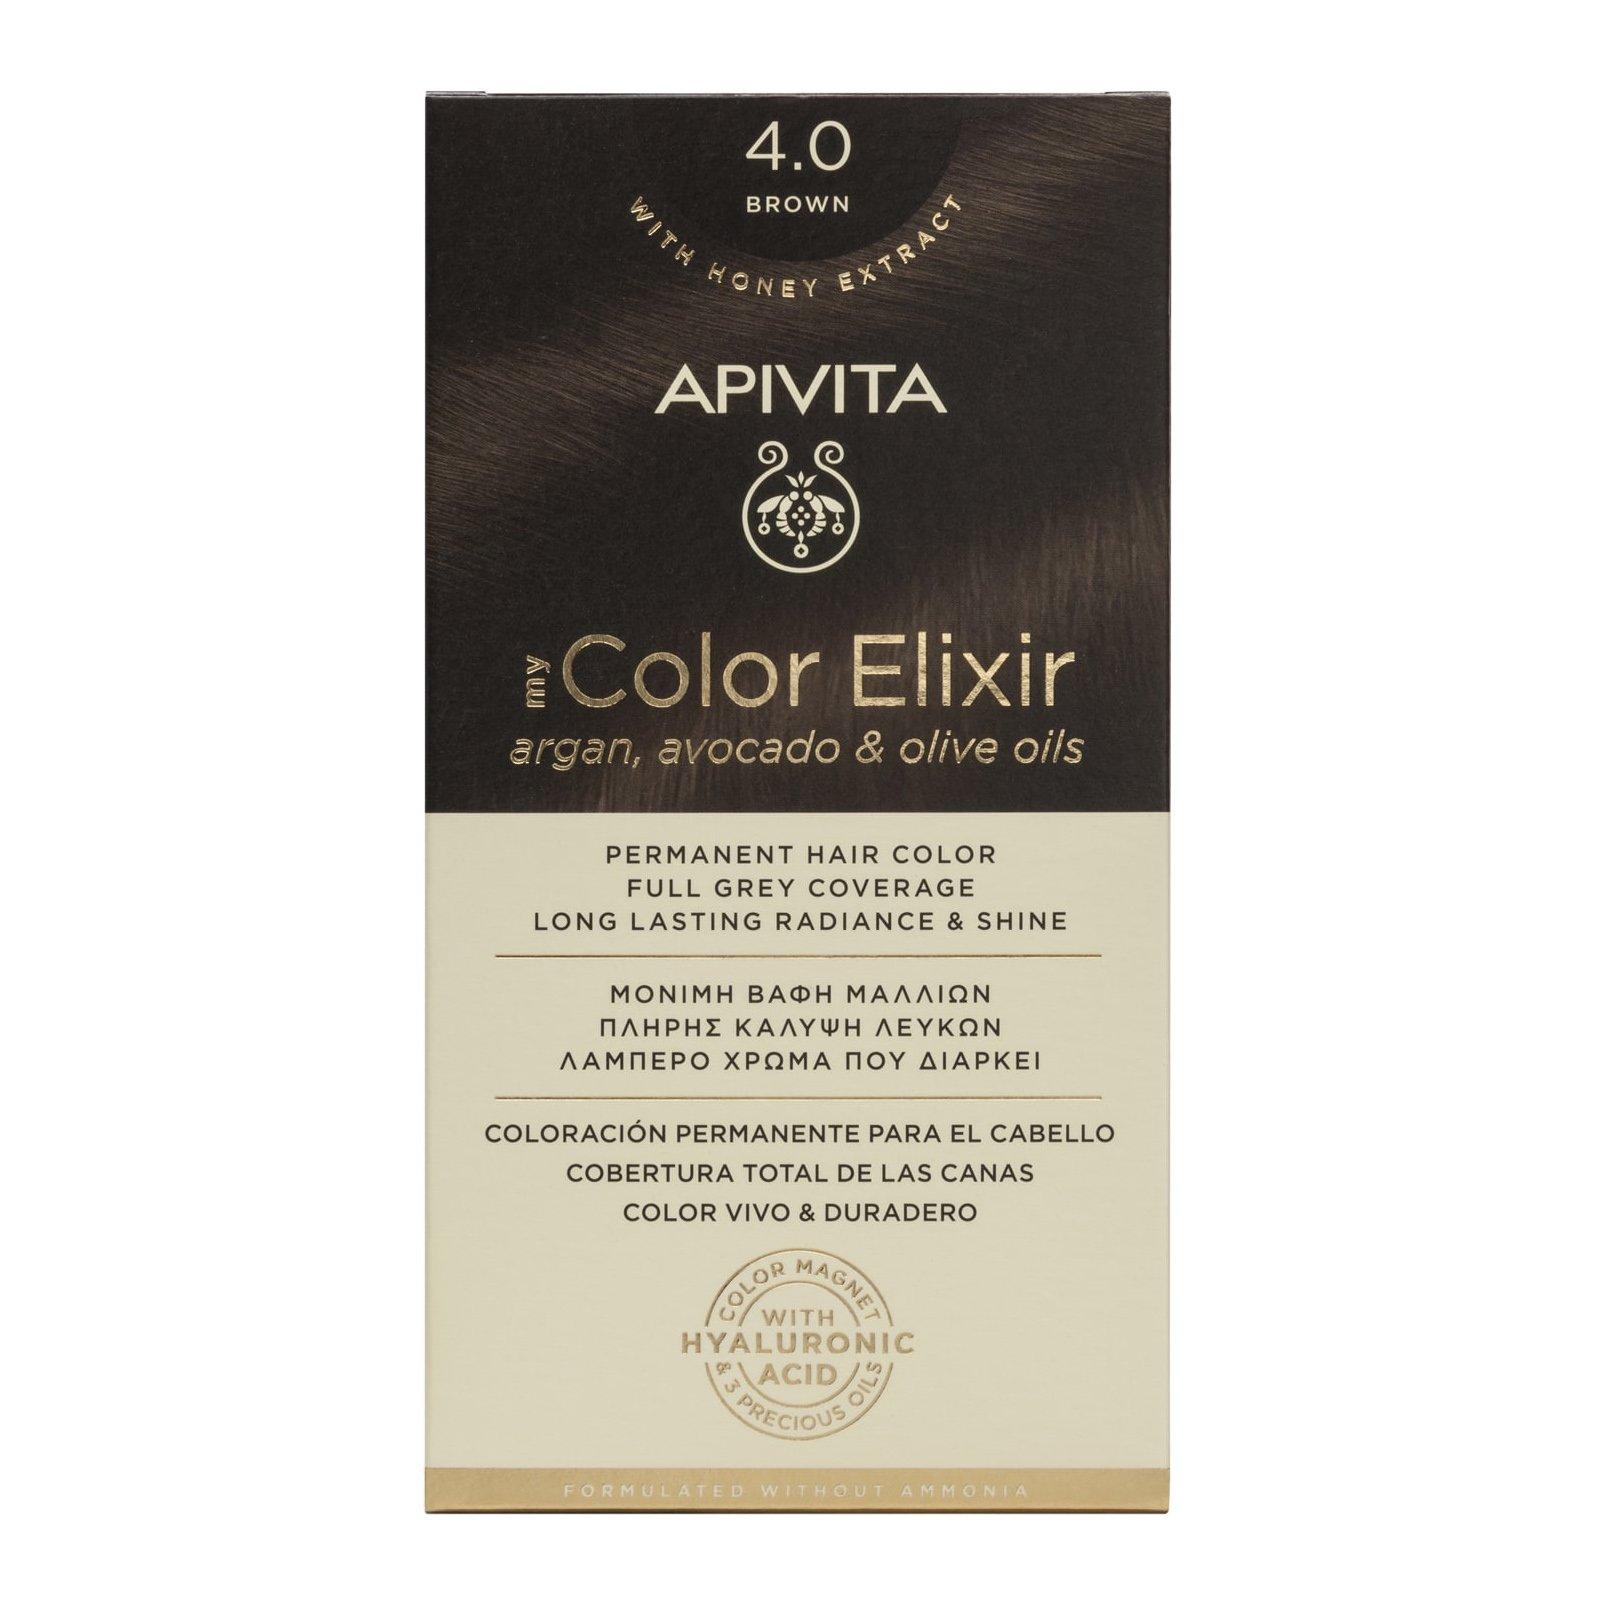 Apivita My Color Elixir Μόνιμη Βαφή Μαλλιών με Καινοτόμο Σύστημα Color Magnet που Σταθεροποιεί και Σφραγίζει το Χρώμα στην Τρίχα – N 4.0 ΦΥΣΙΚΟ ΚΑΣΤΑΝΟ